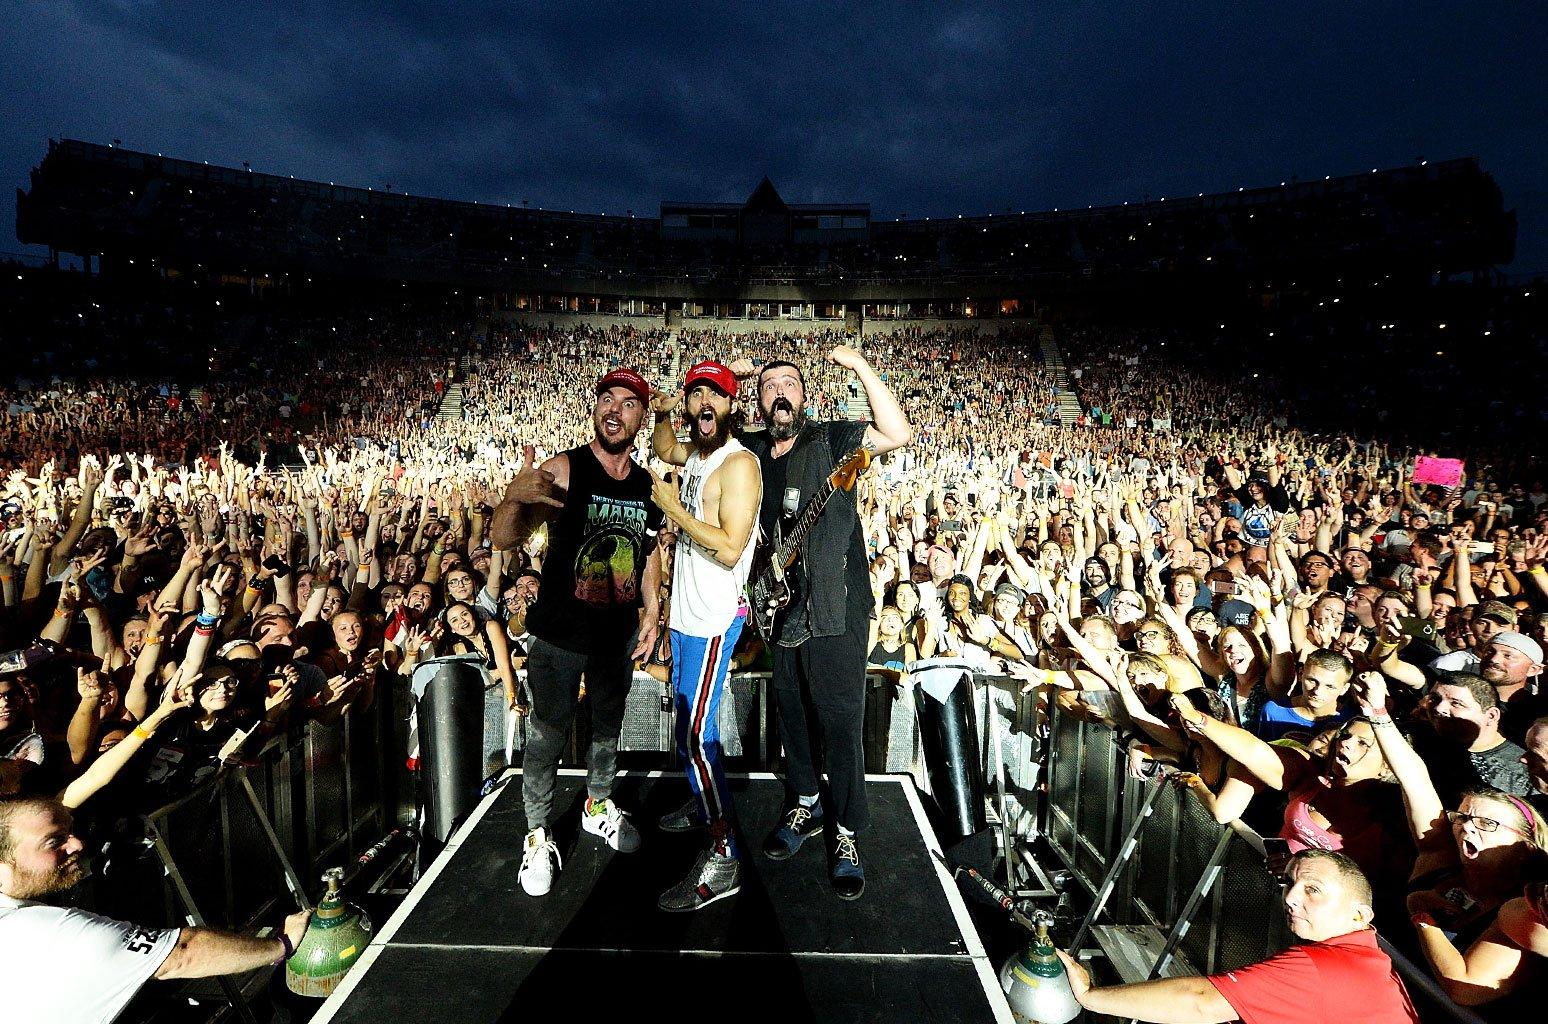 Thirty Seconds to Mars announce new album release date & summer tour dates https://t.co/dg5fDugKar https://t.co/mju9ncbQSl